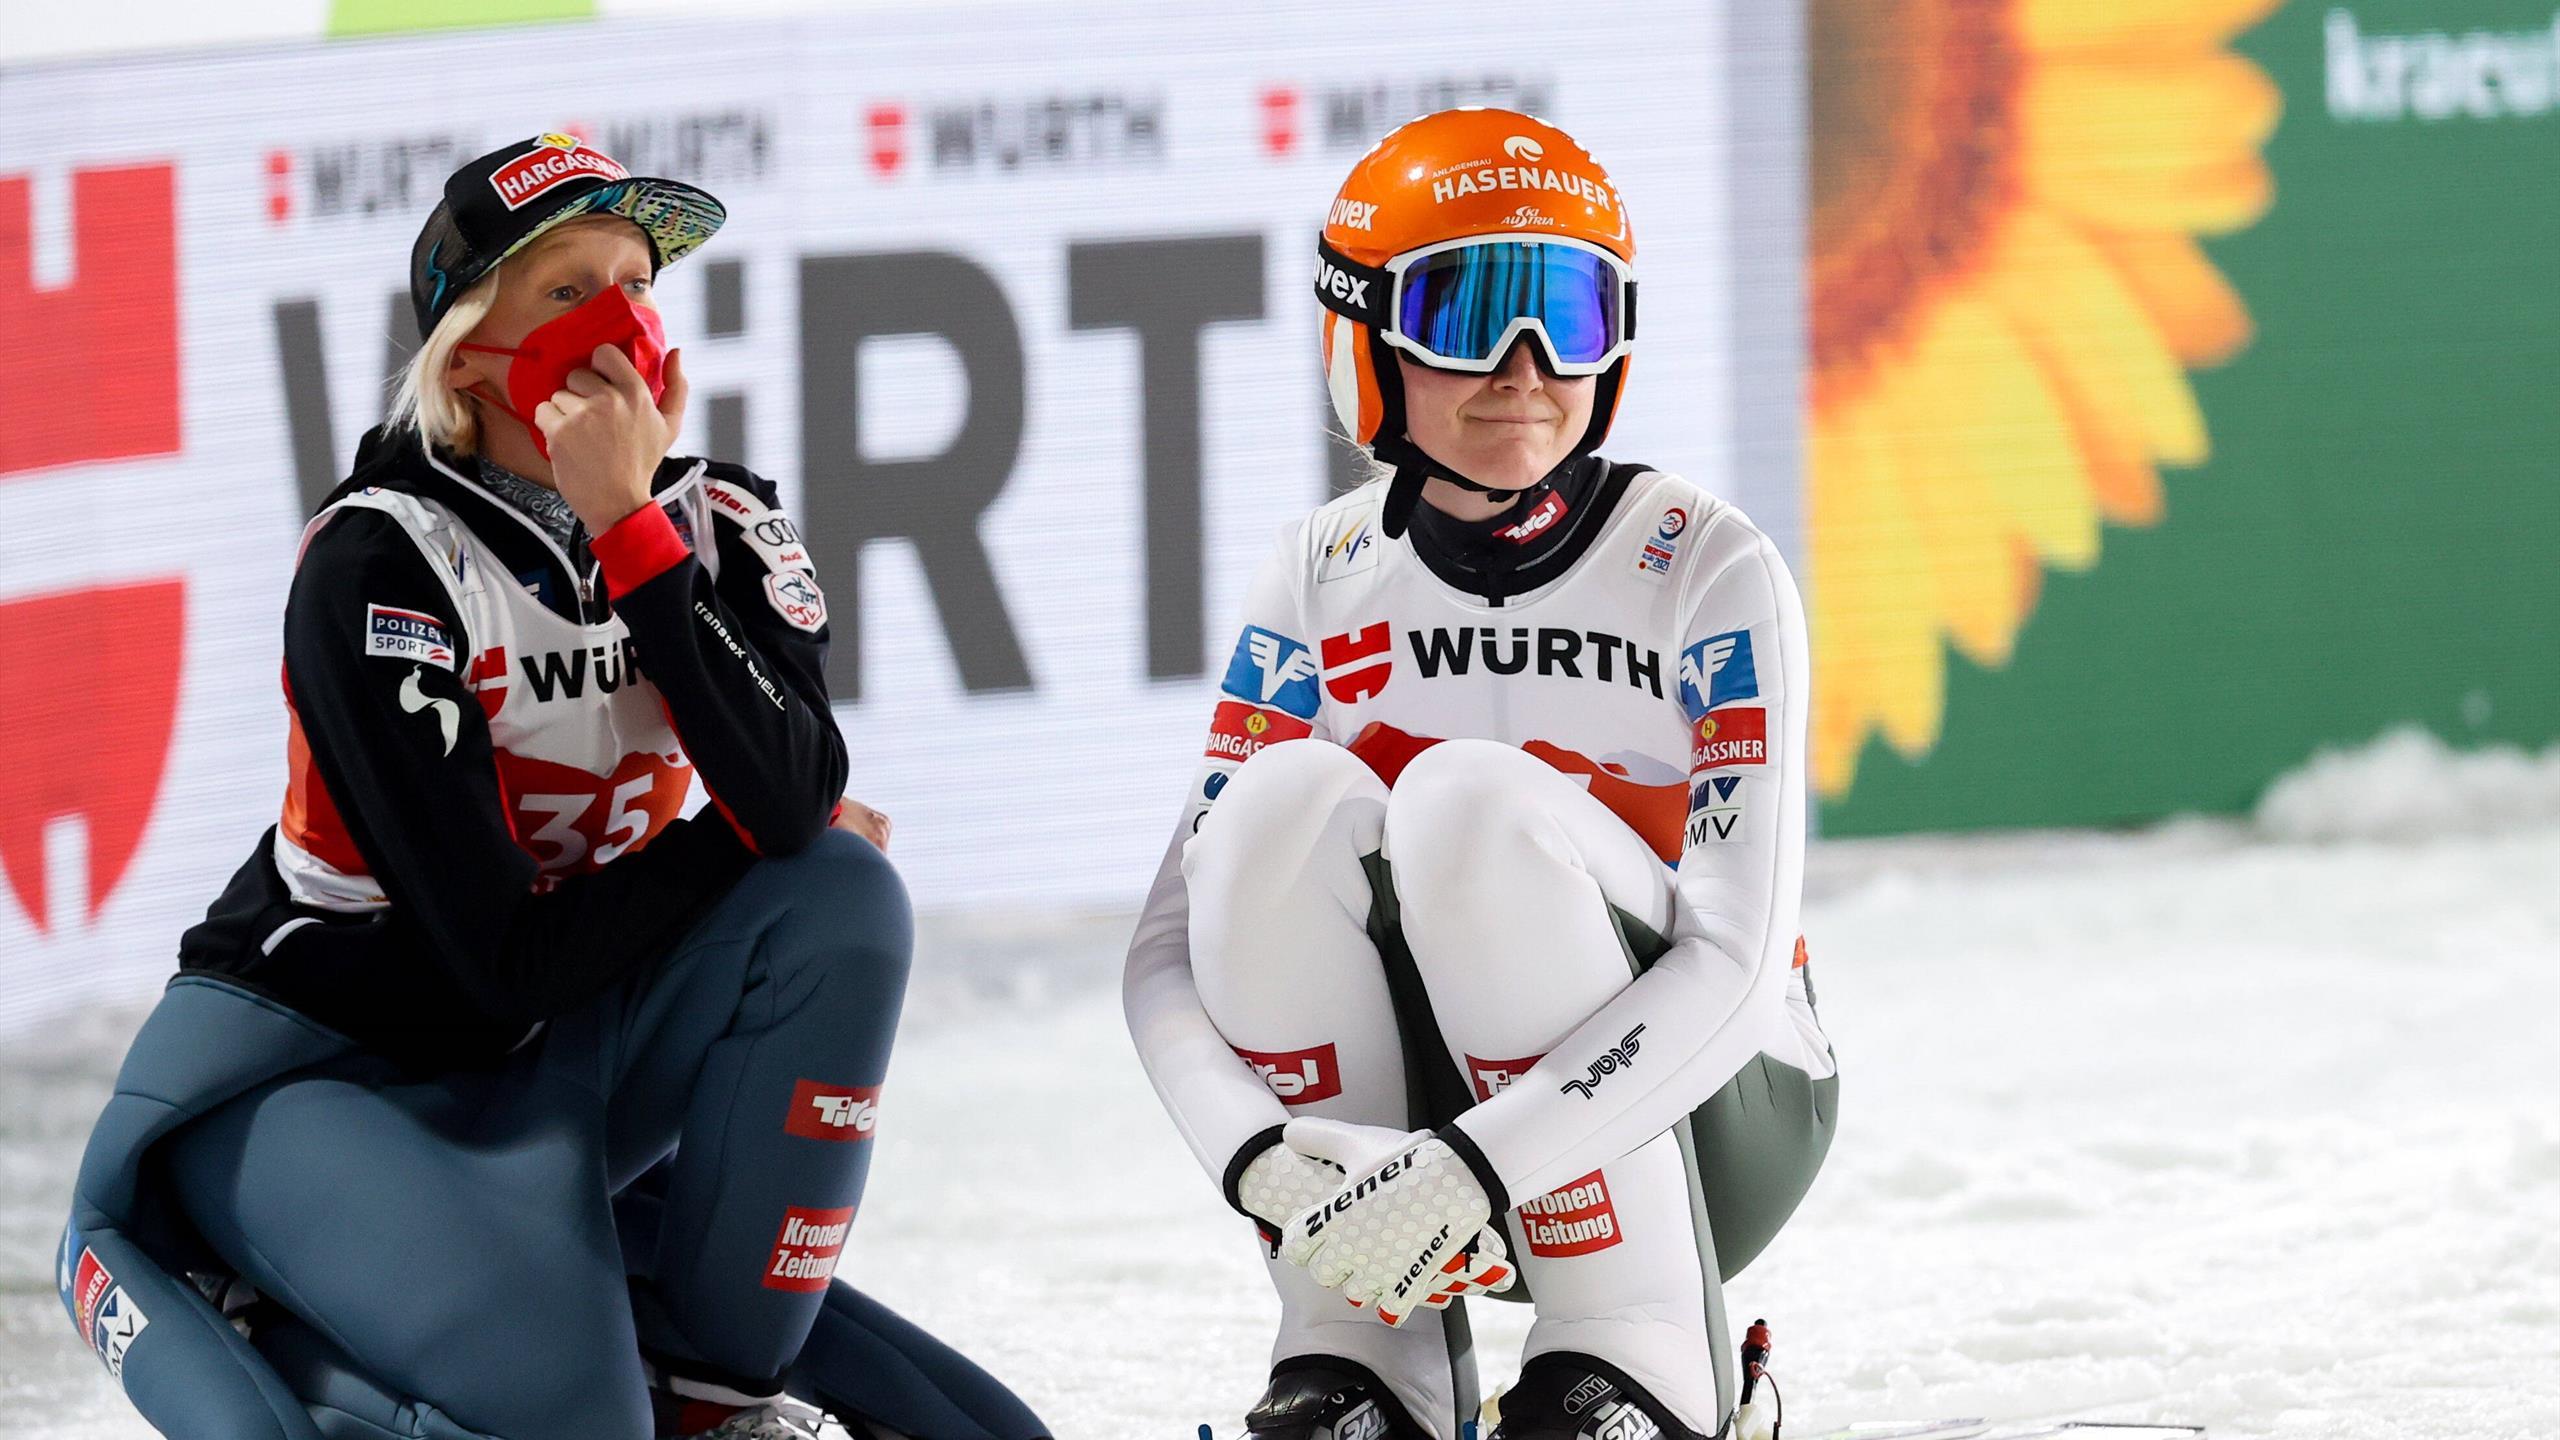 WM Oberstdorf - Drama um Marita Kramer: Technischer Delegierter erklärt Anlaufverkürzung - Eurosport DE